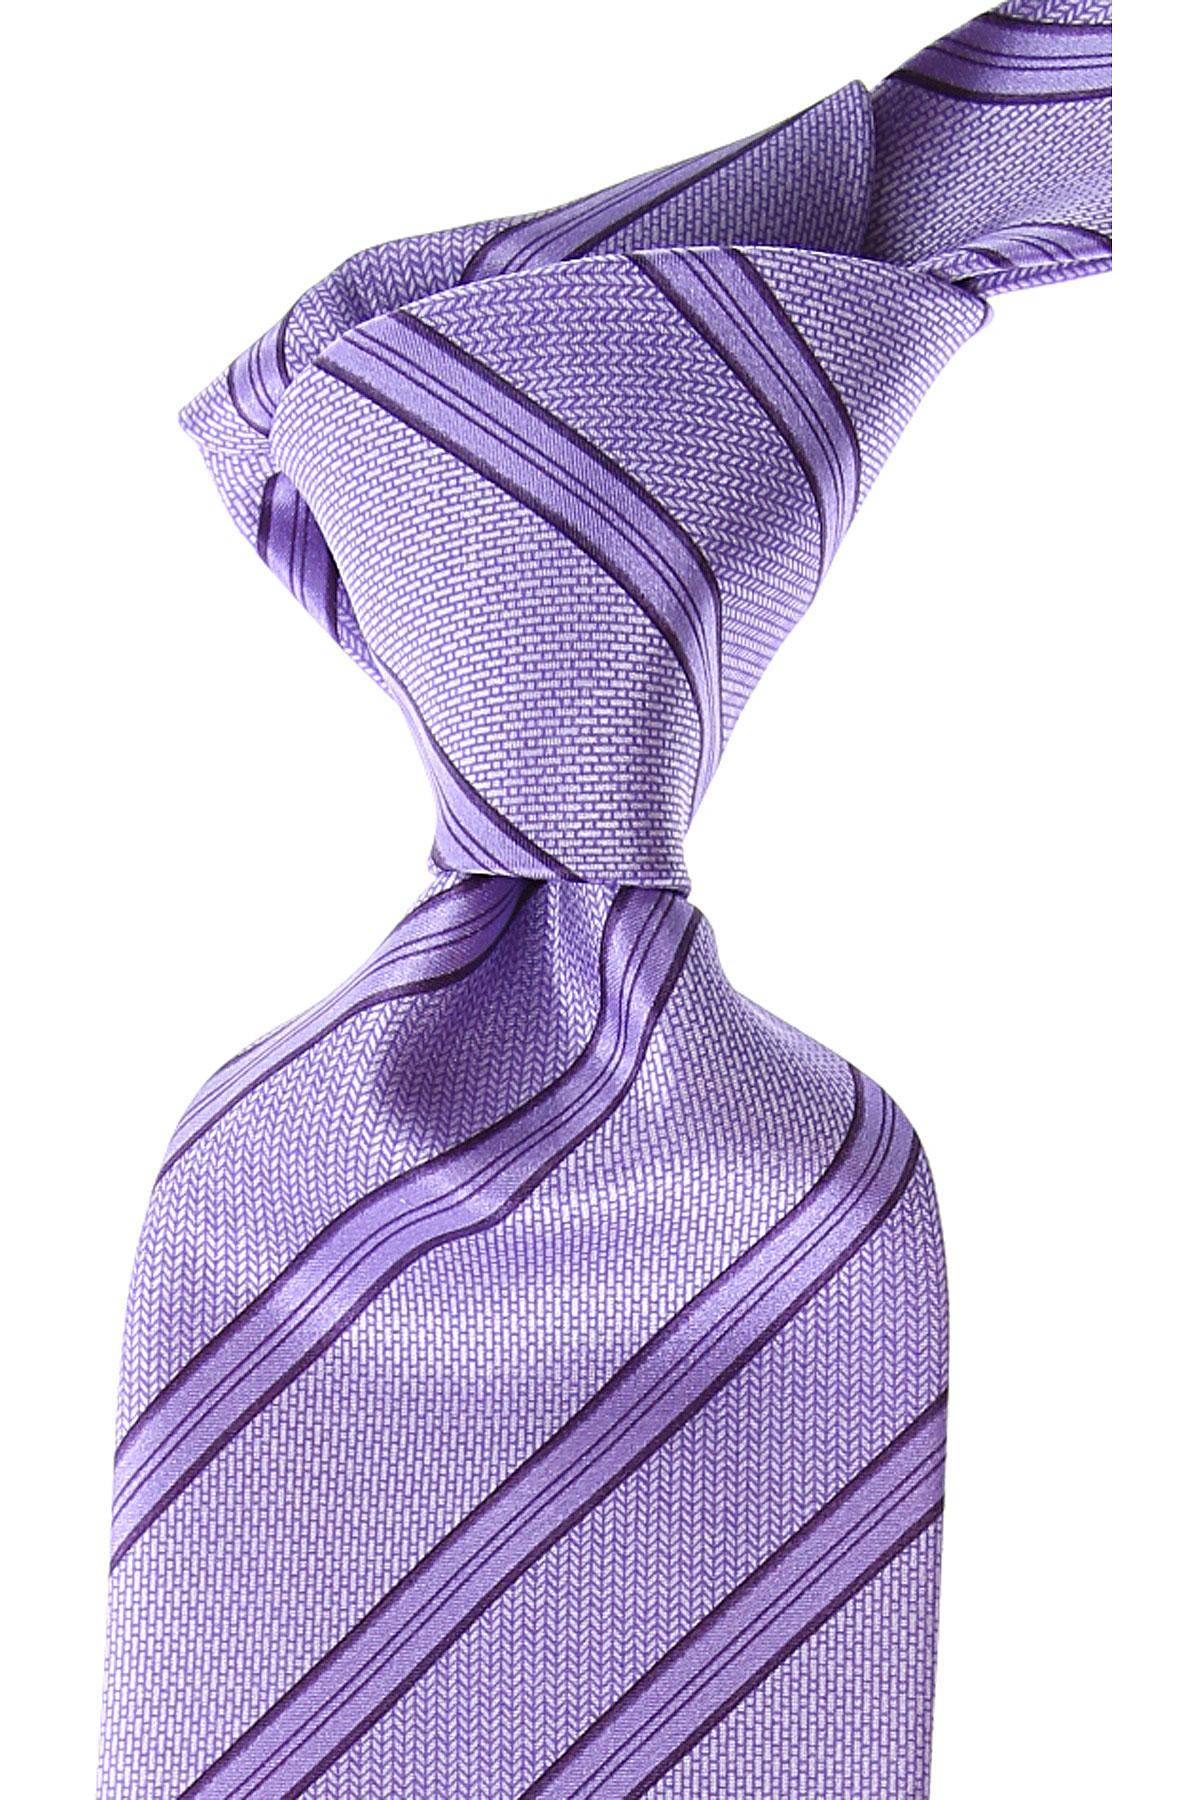 Brioni Ties On Sale, Bright Lilac, Silk, 2019